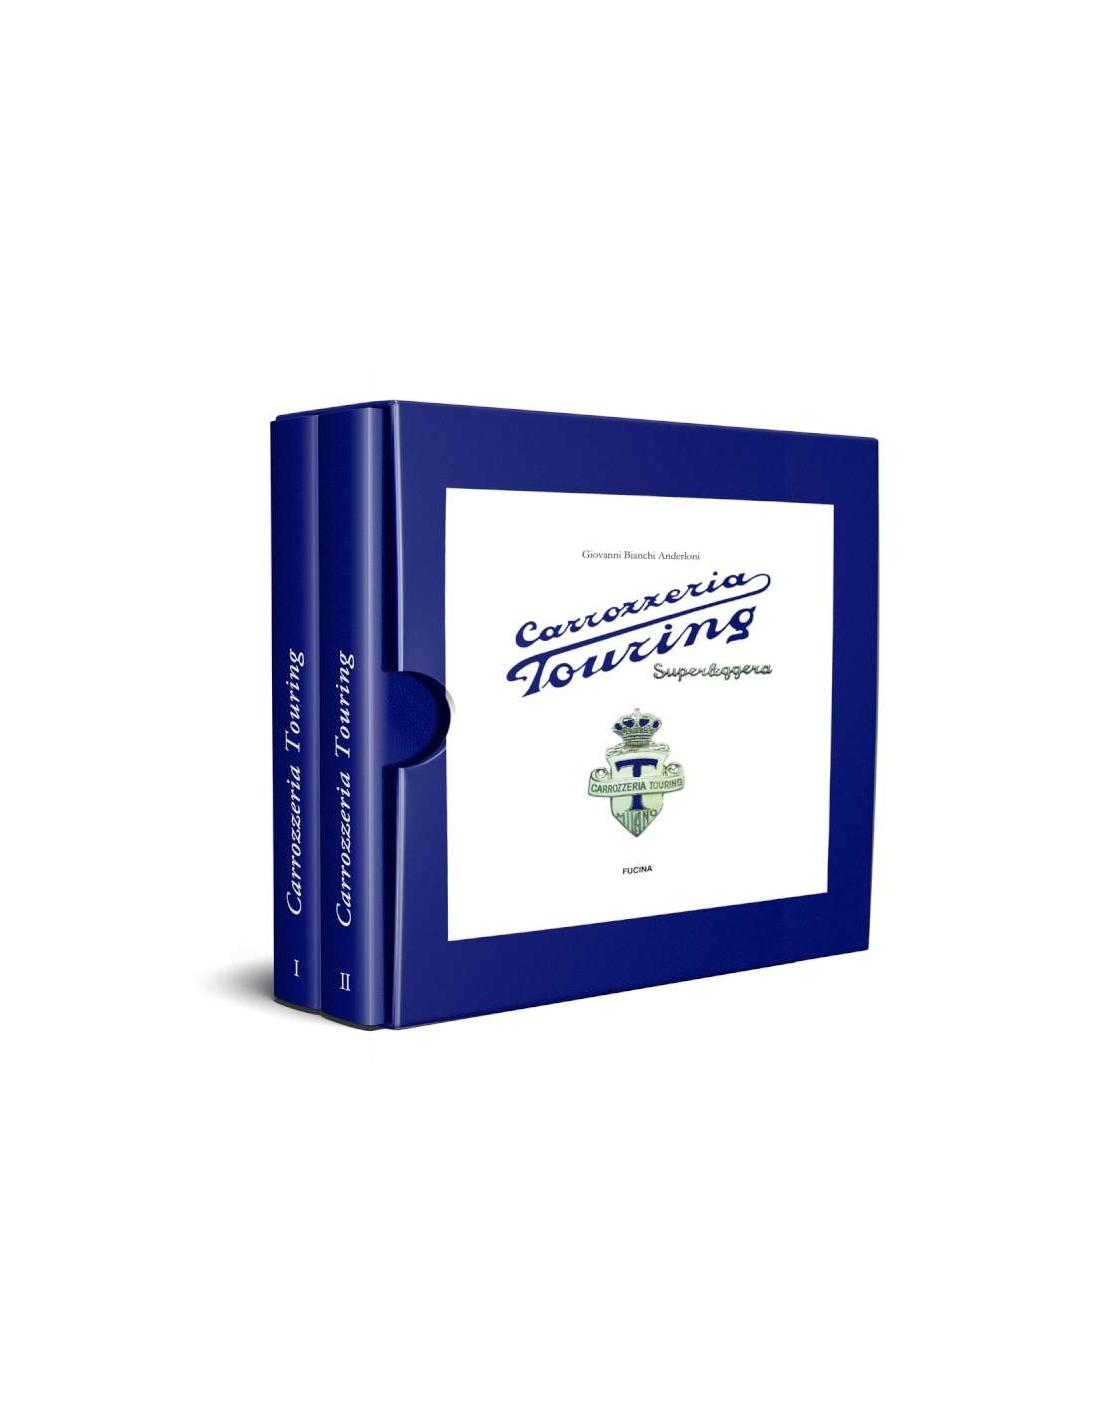 carrozzeria touring superleggera (english edition) - book